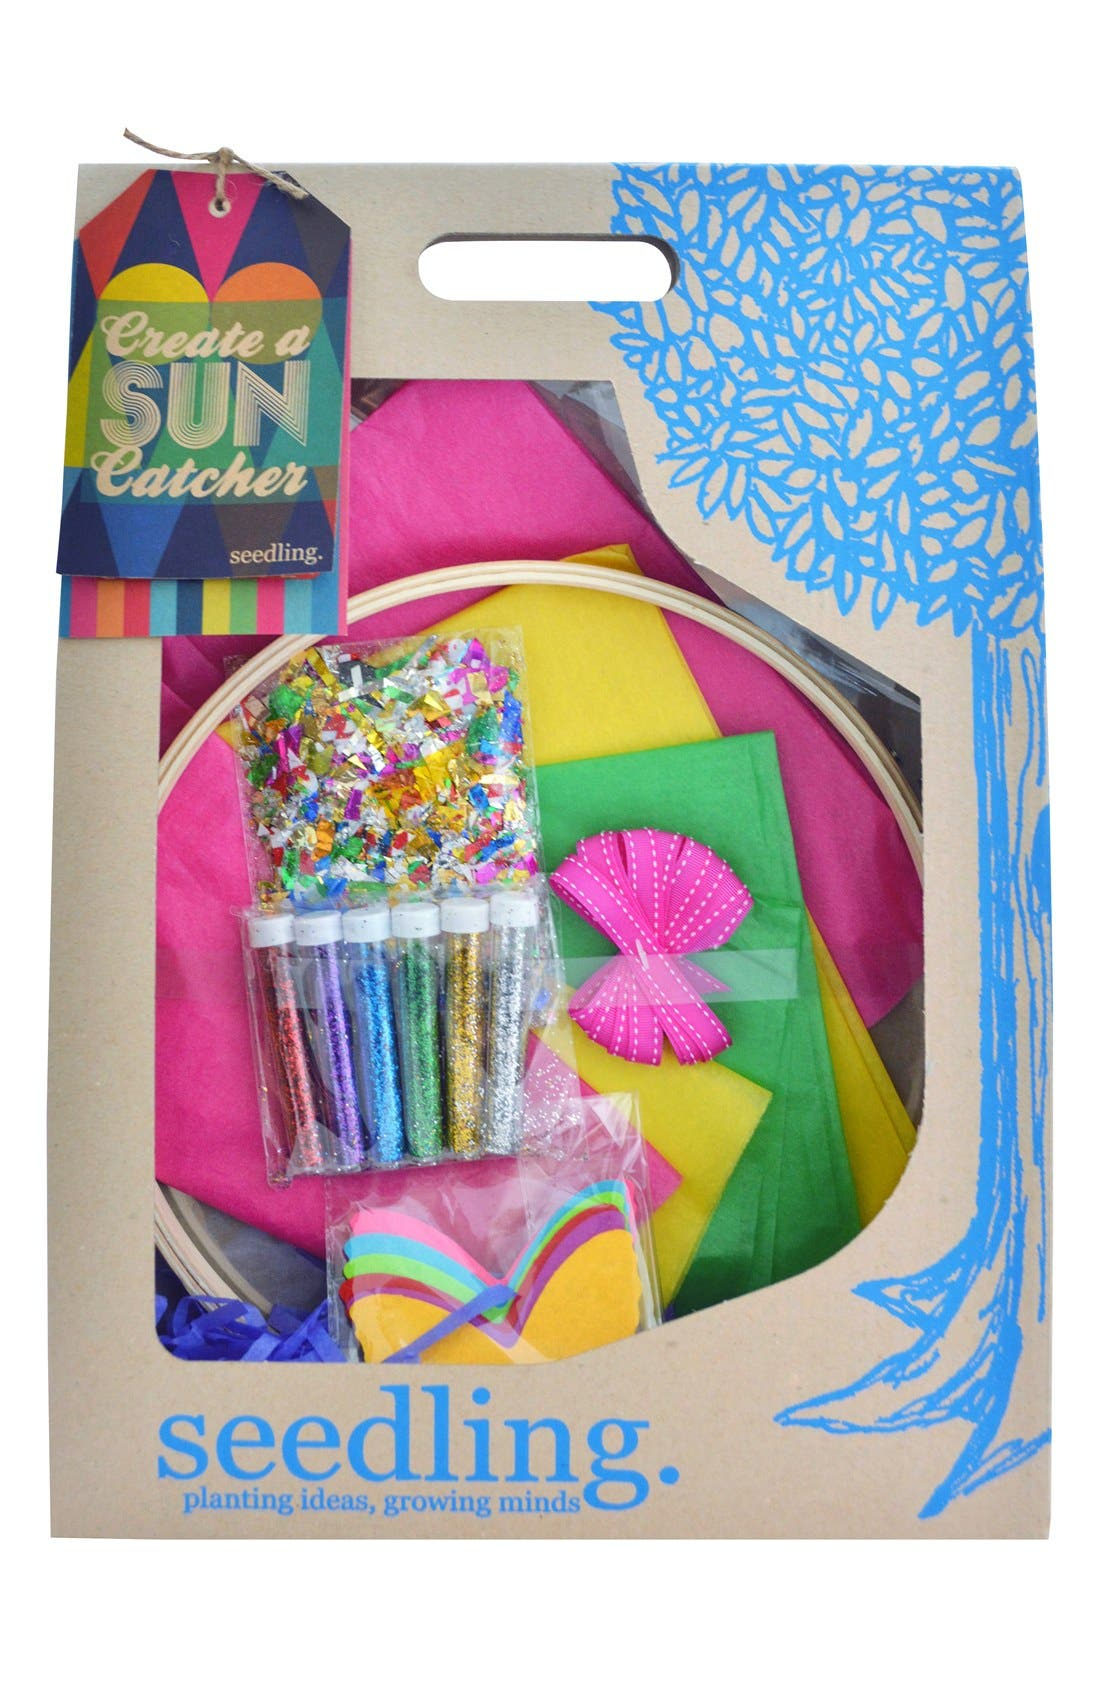 'Create a Suncatcher' Kit,                             Main thumbnail 1, color,                             960